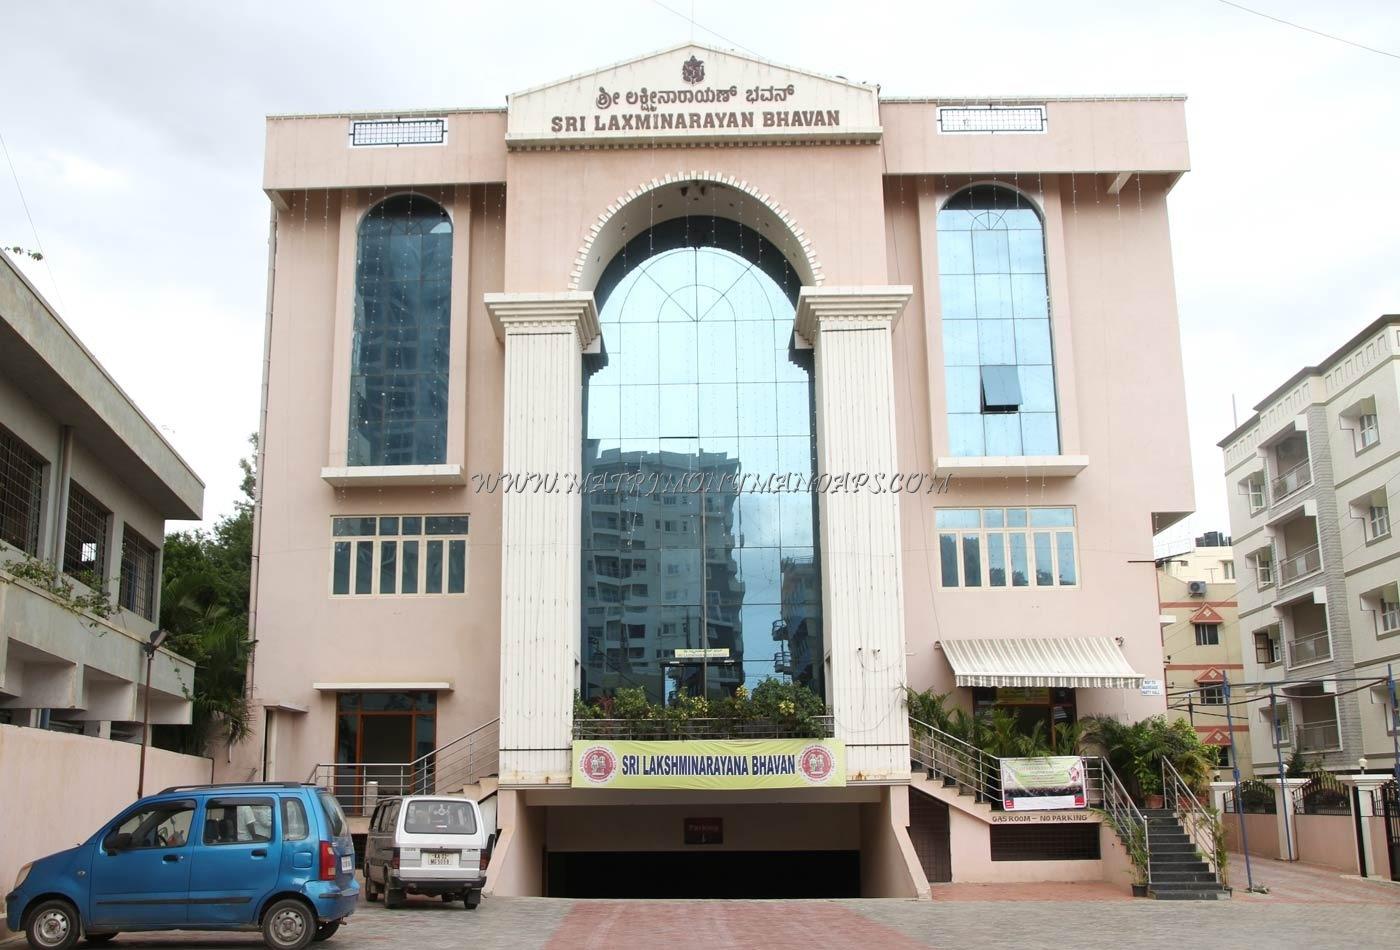 Find More Convention Halls in KR Puram